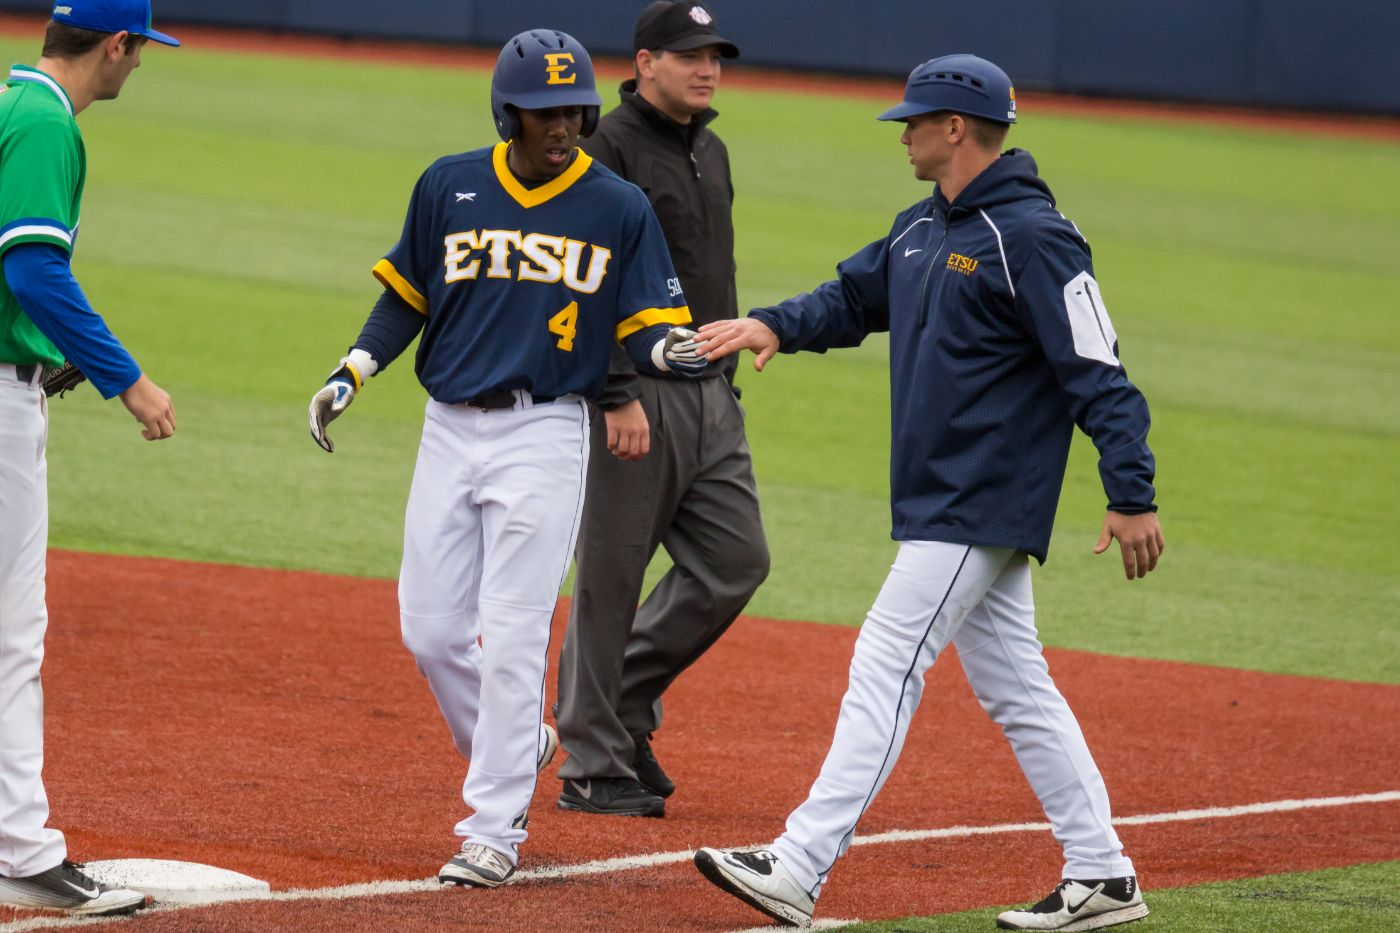 SoCon play starts Thursday for ETSU Baseball at Western Carolina